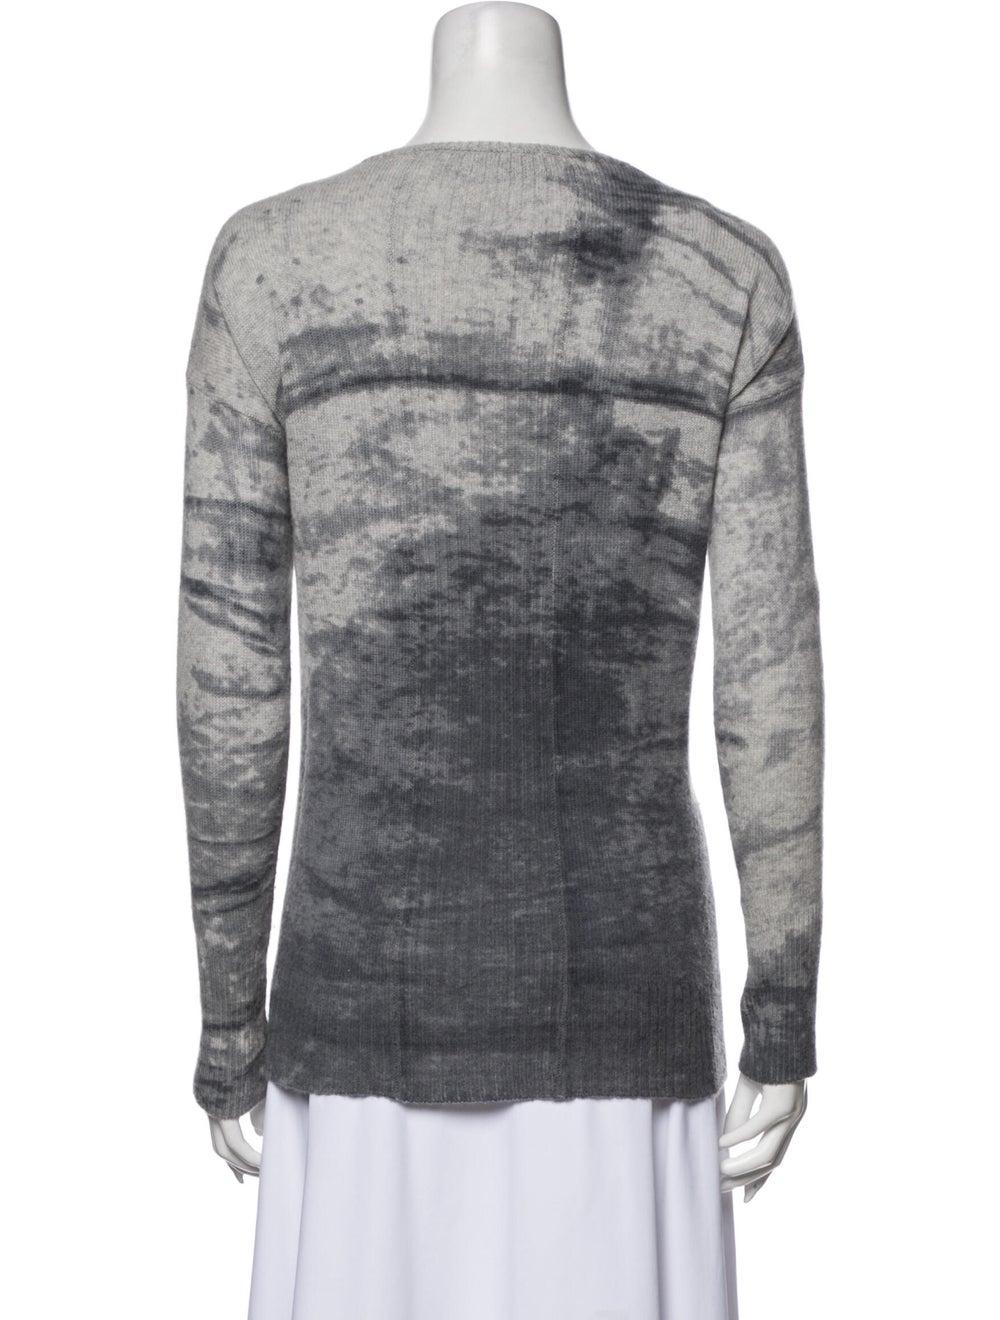 360 Cashmere Cashmere Tie-Dye Print Sweater Grey - image 3